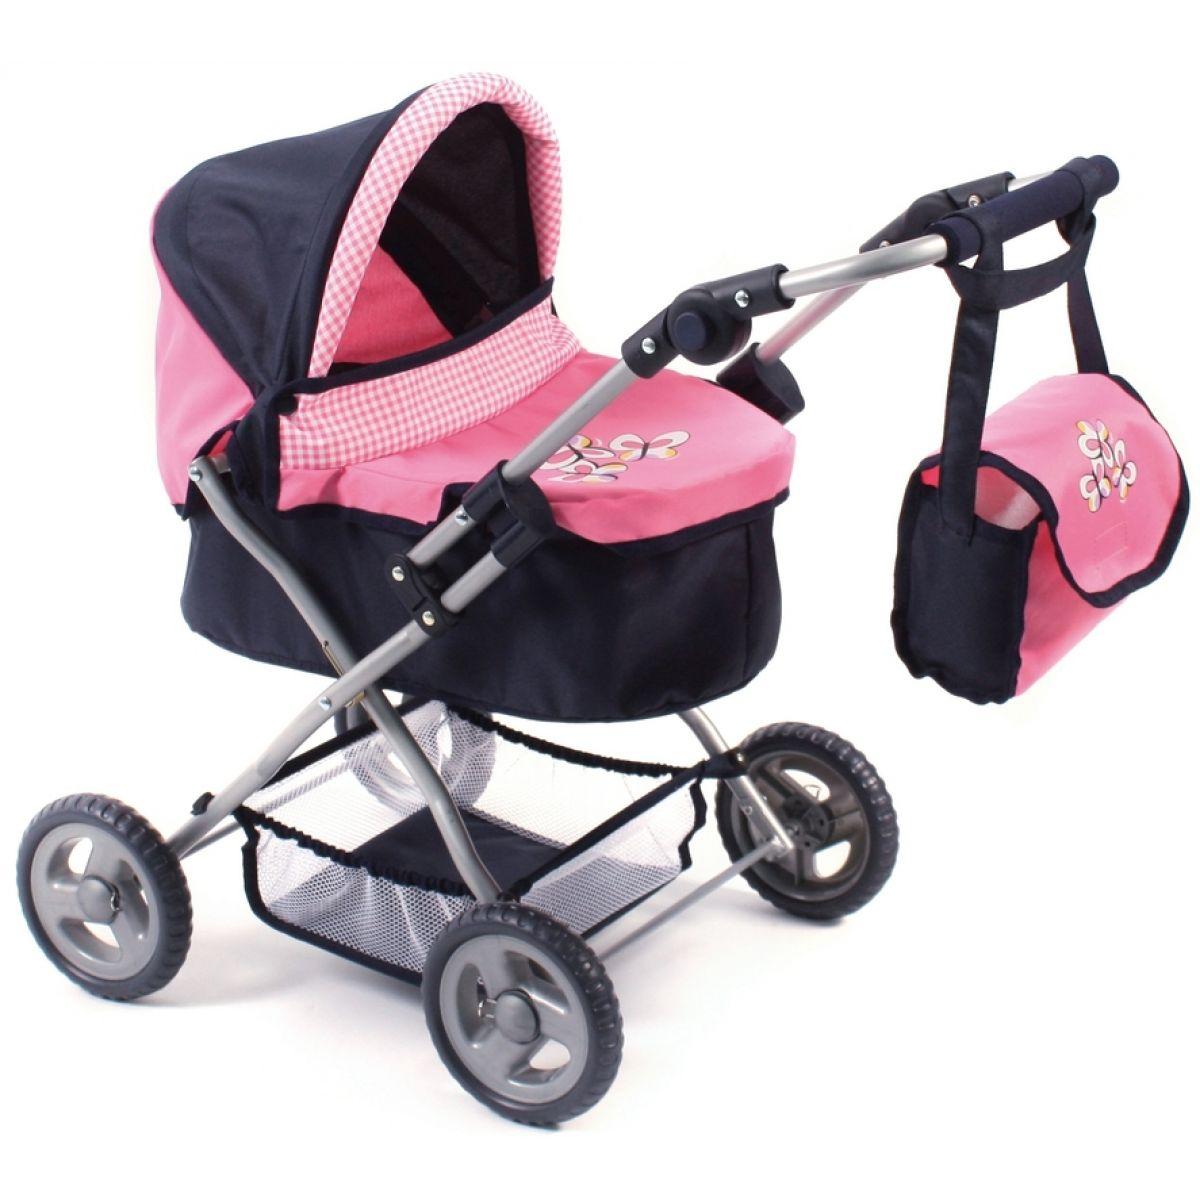 Bayer Chic Kočárek pro panenky Picobello - pink checker